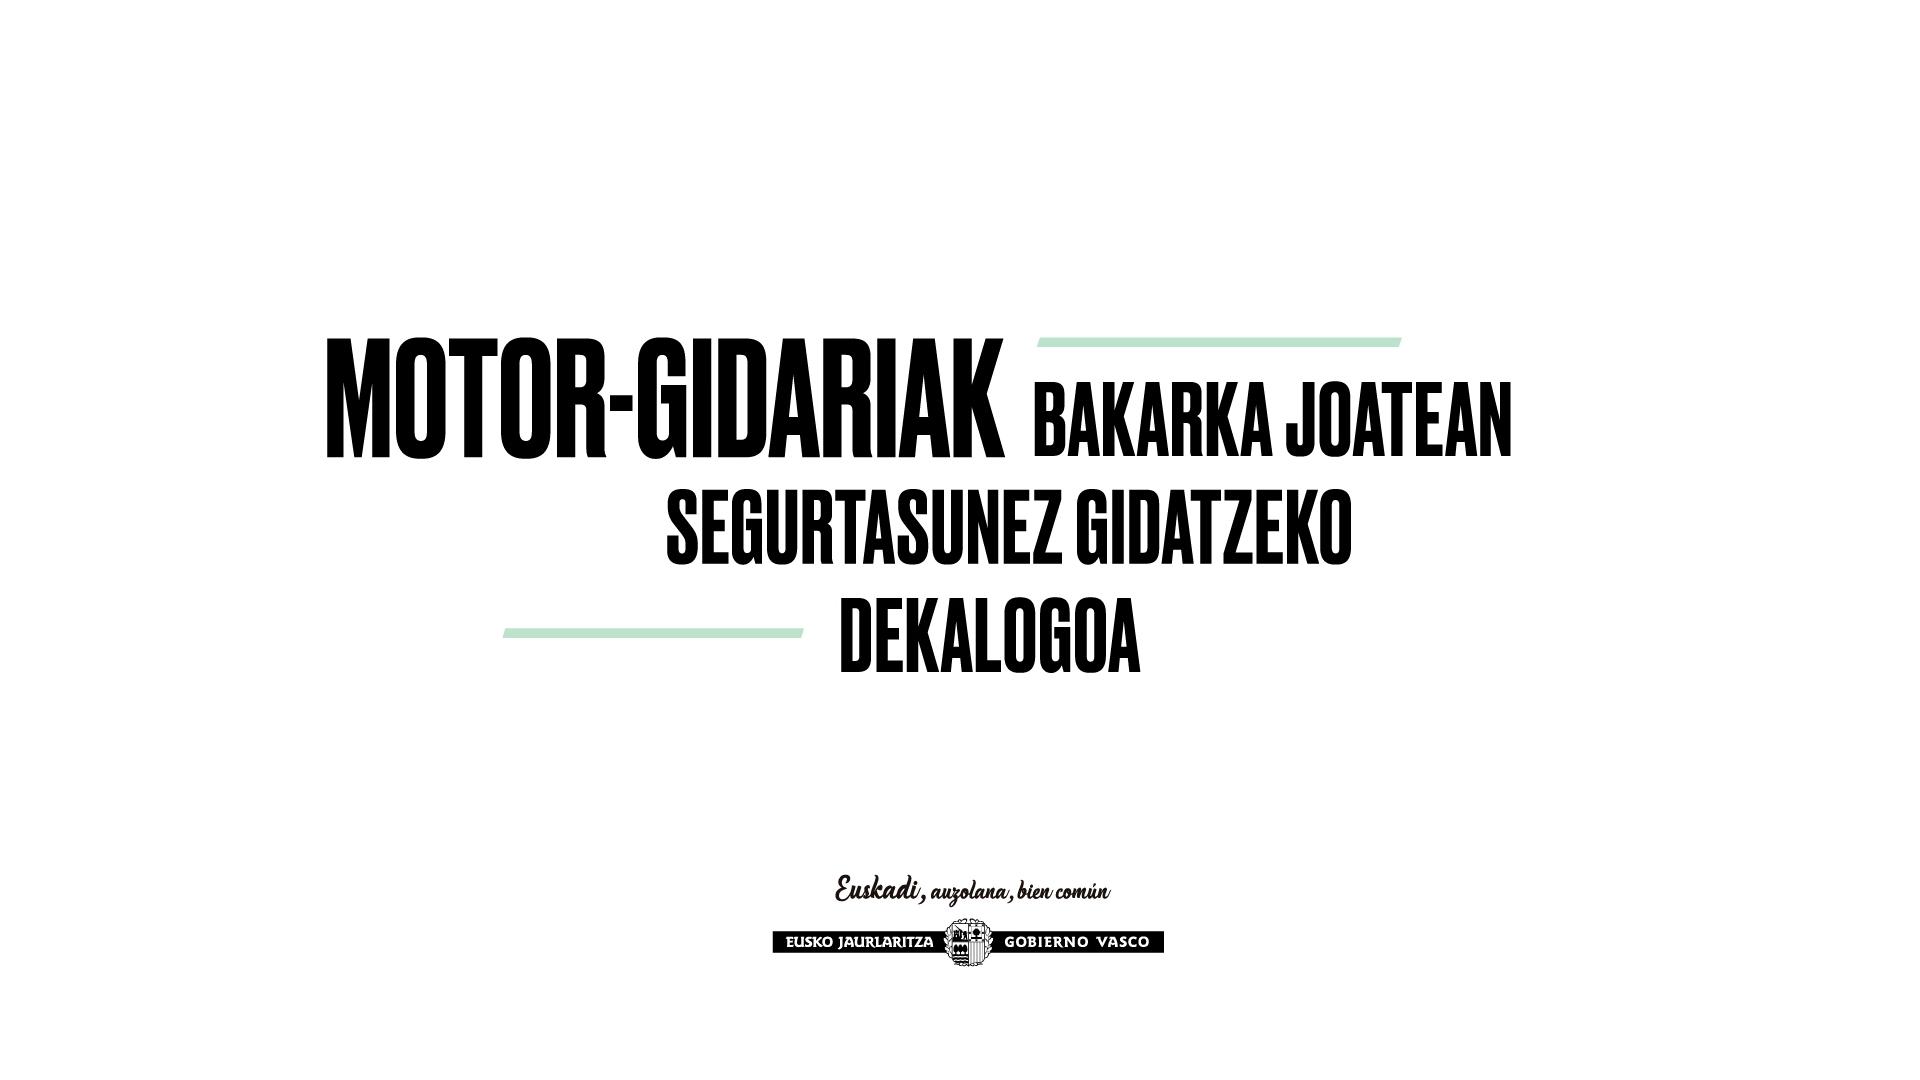 motor_gidari_dekalogoa.png